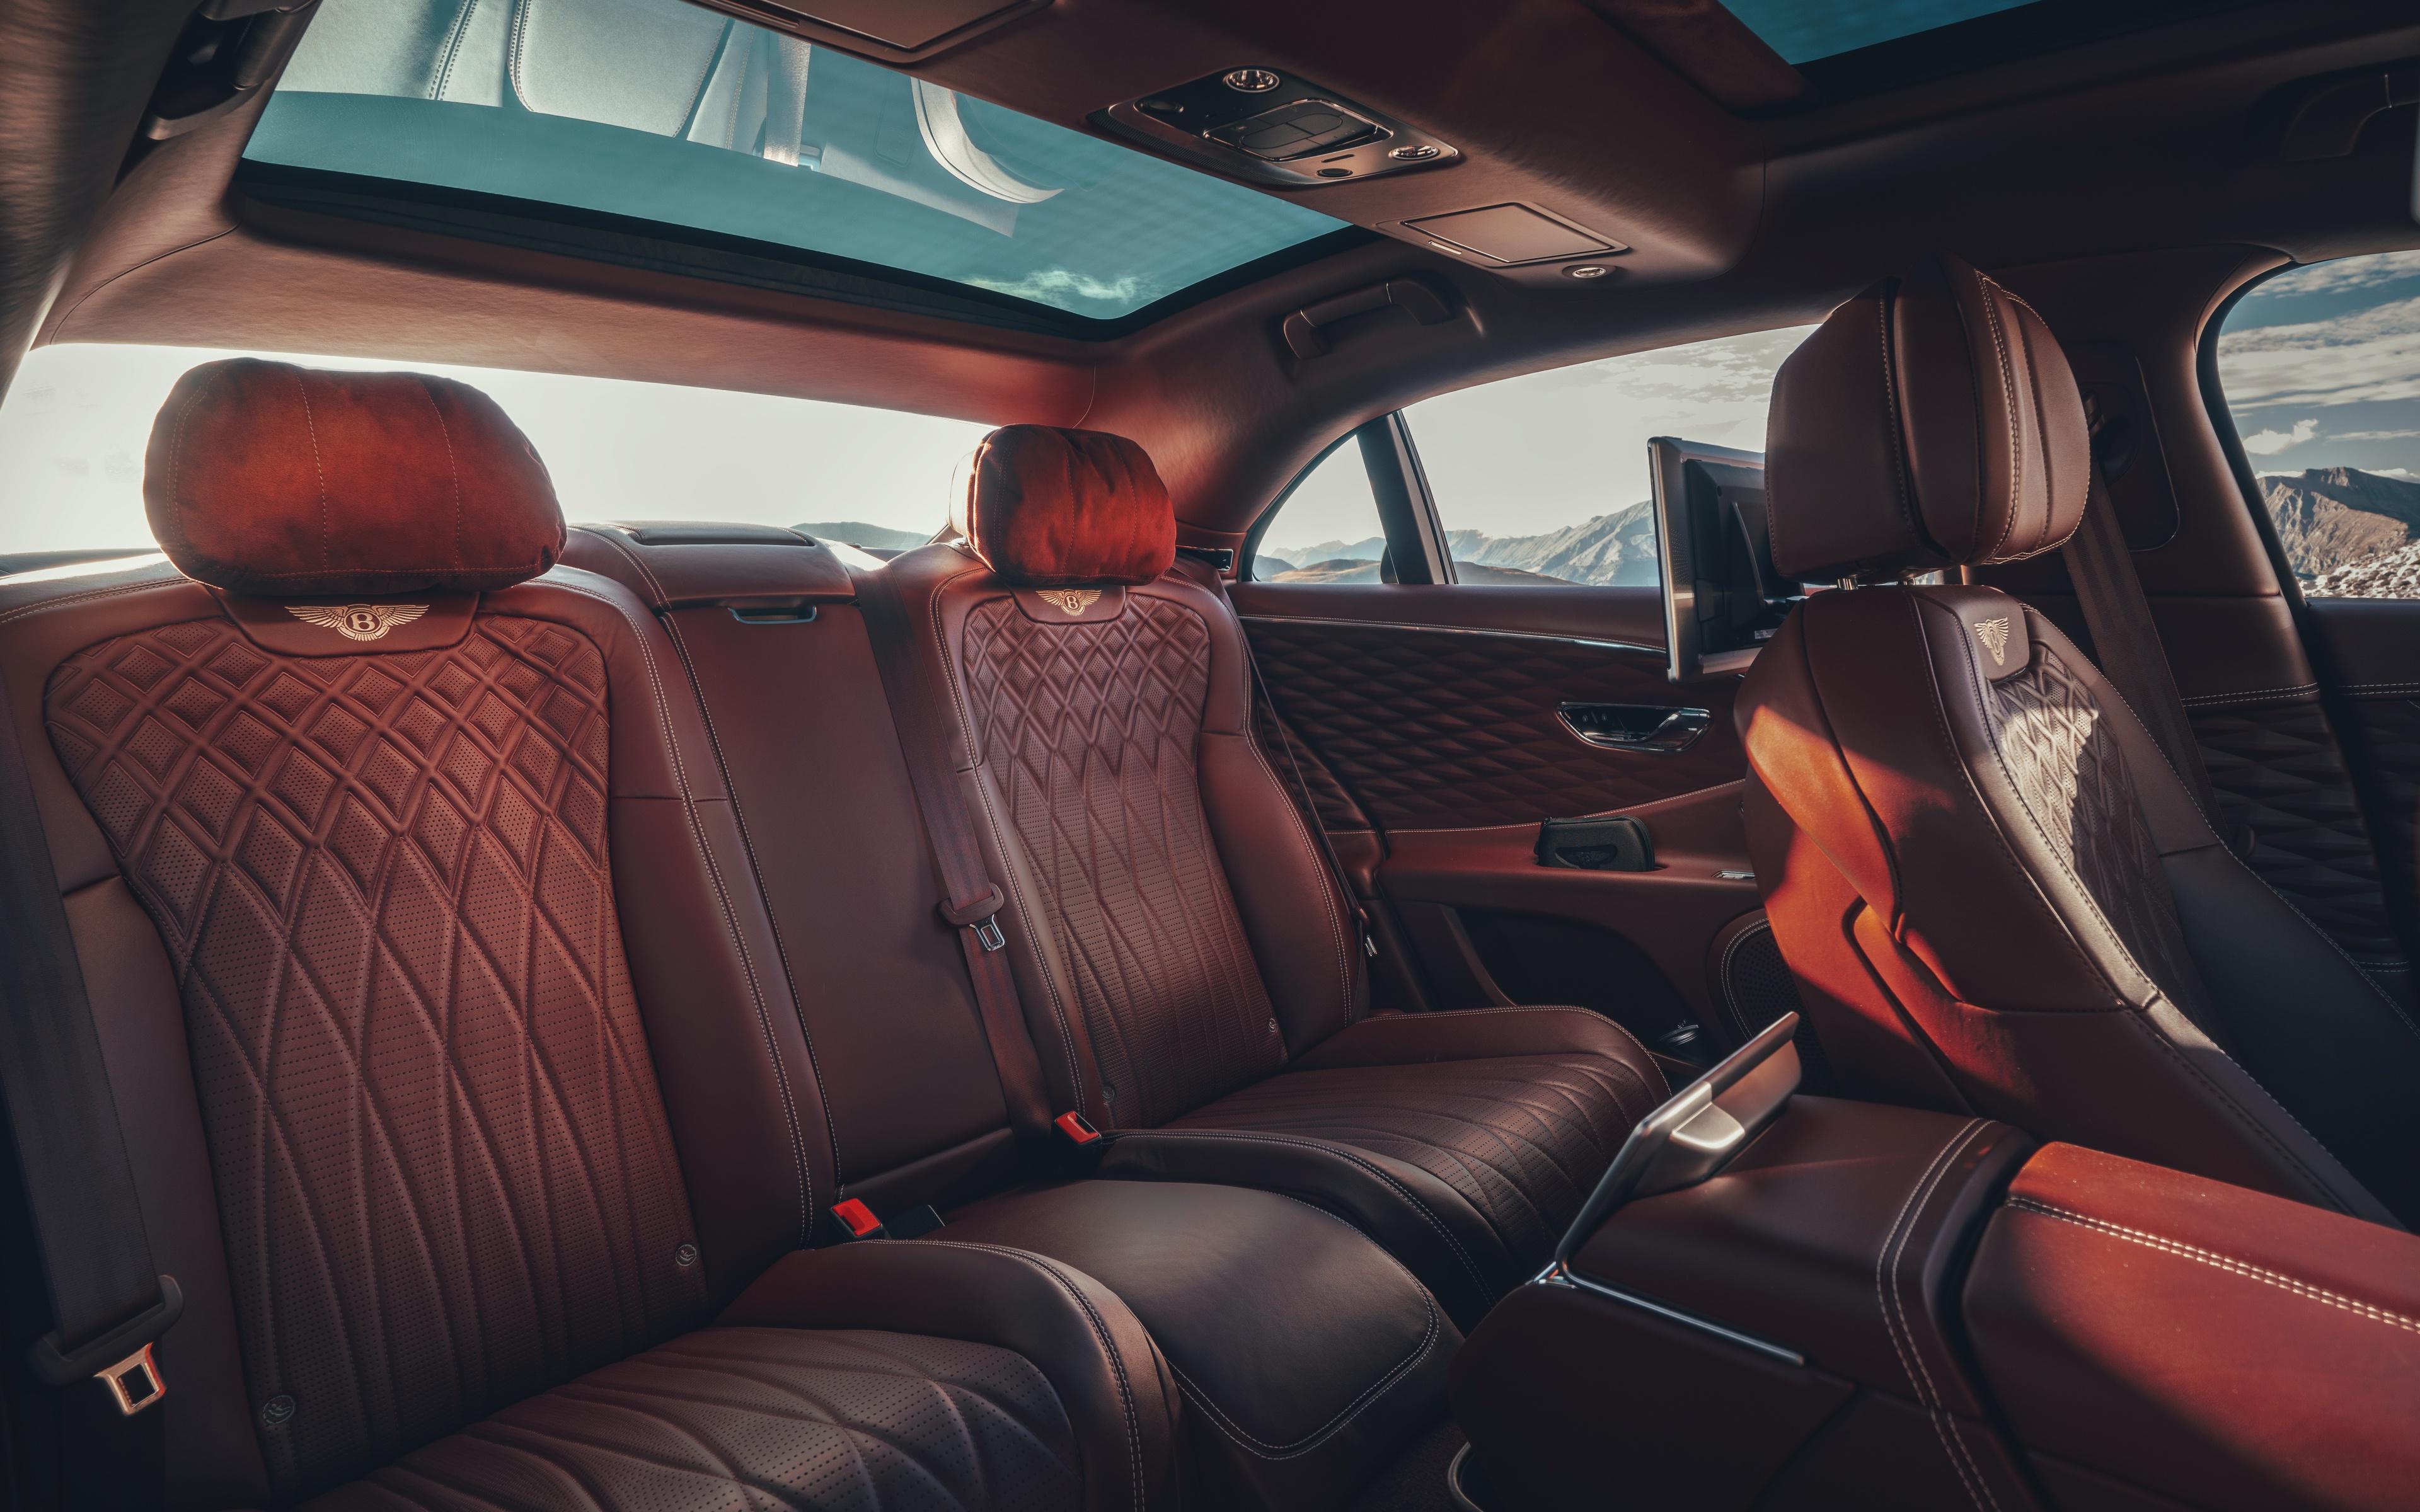 Luxury Bentley Interior Car Car Interior Vehicle Luxury Cars 3840x2400 Wallpaper Wallhaven Cc